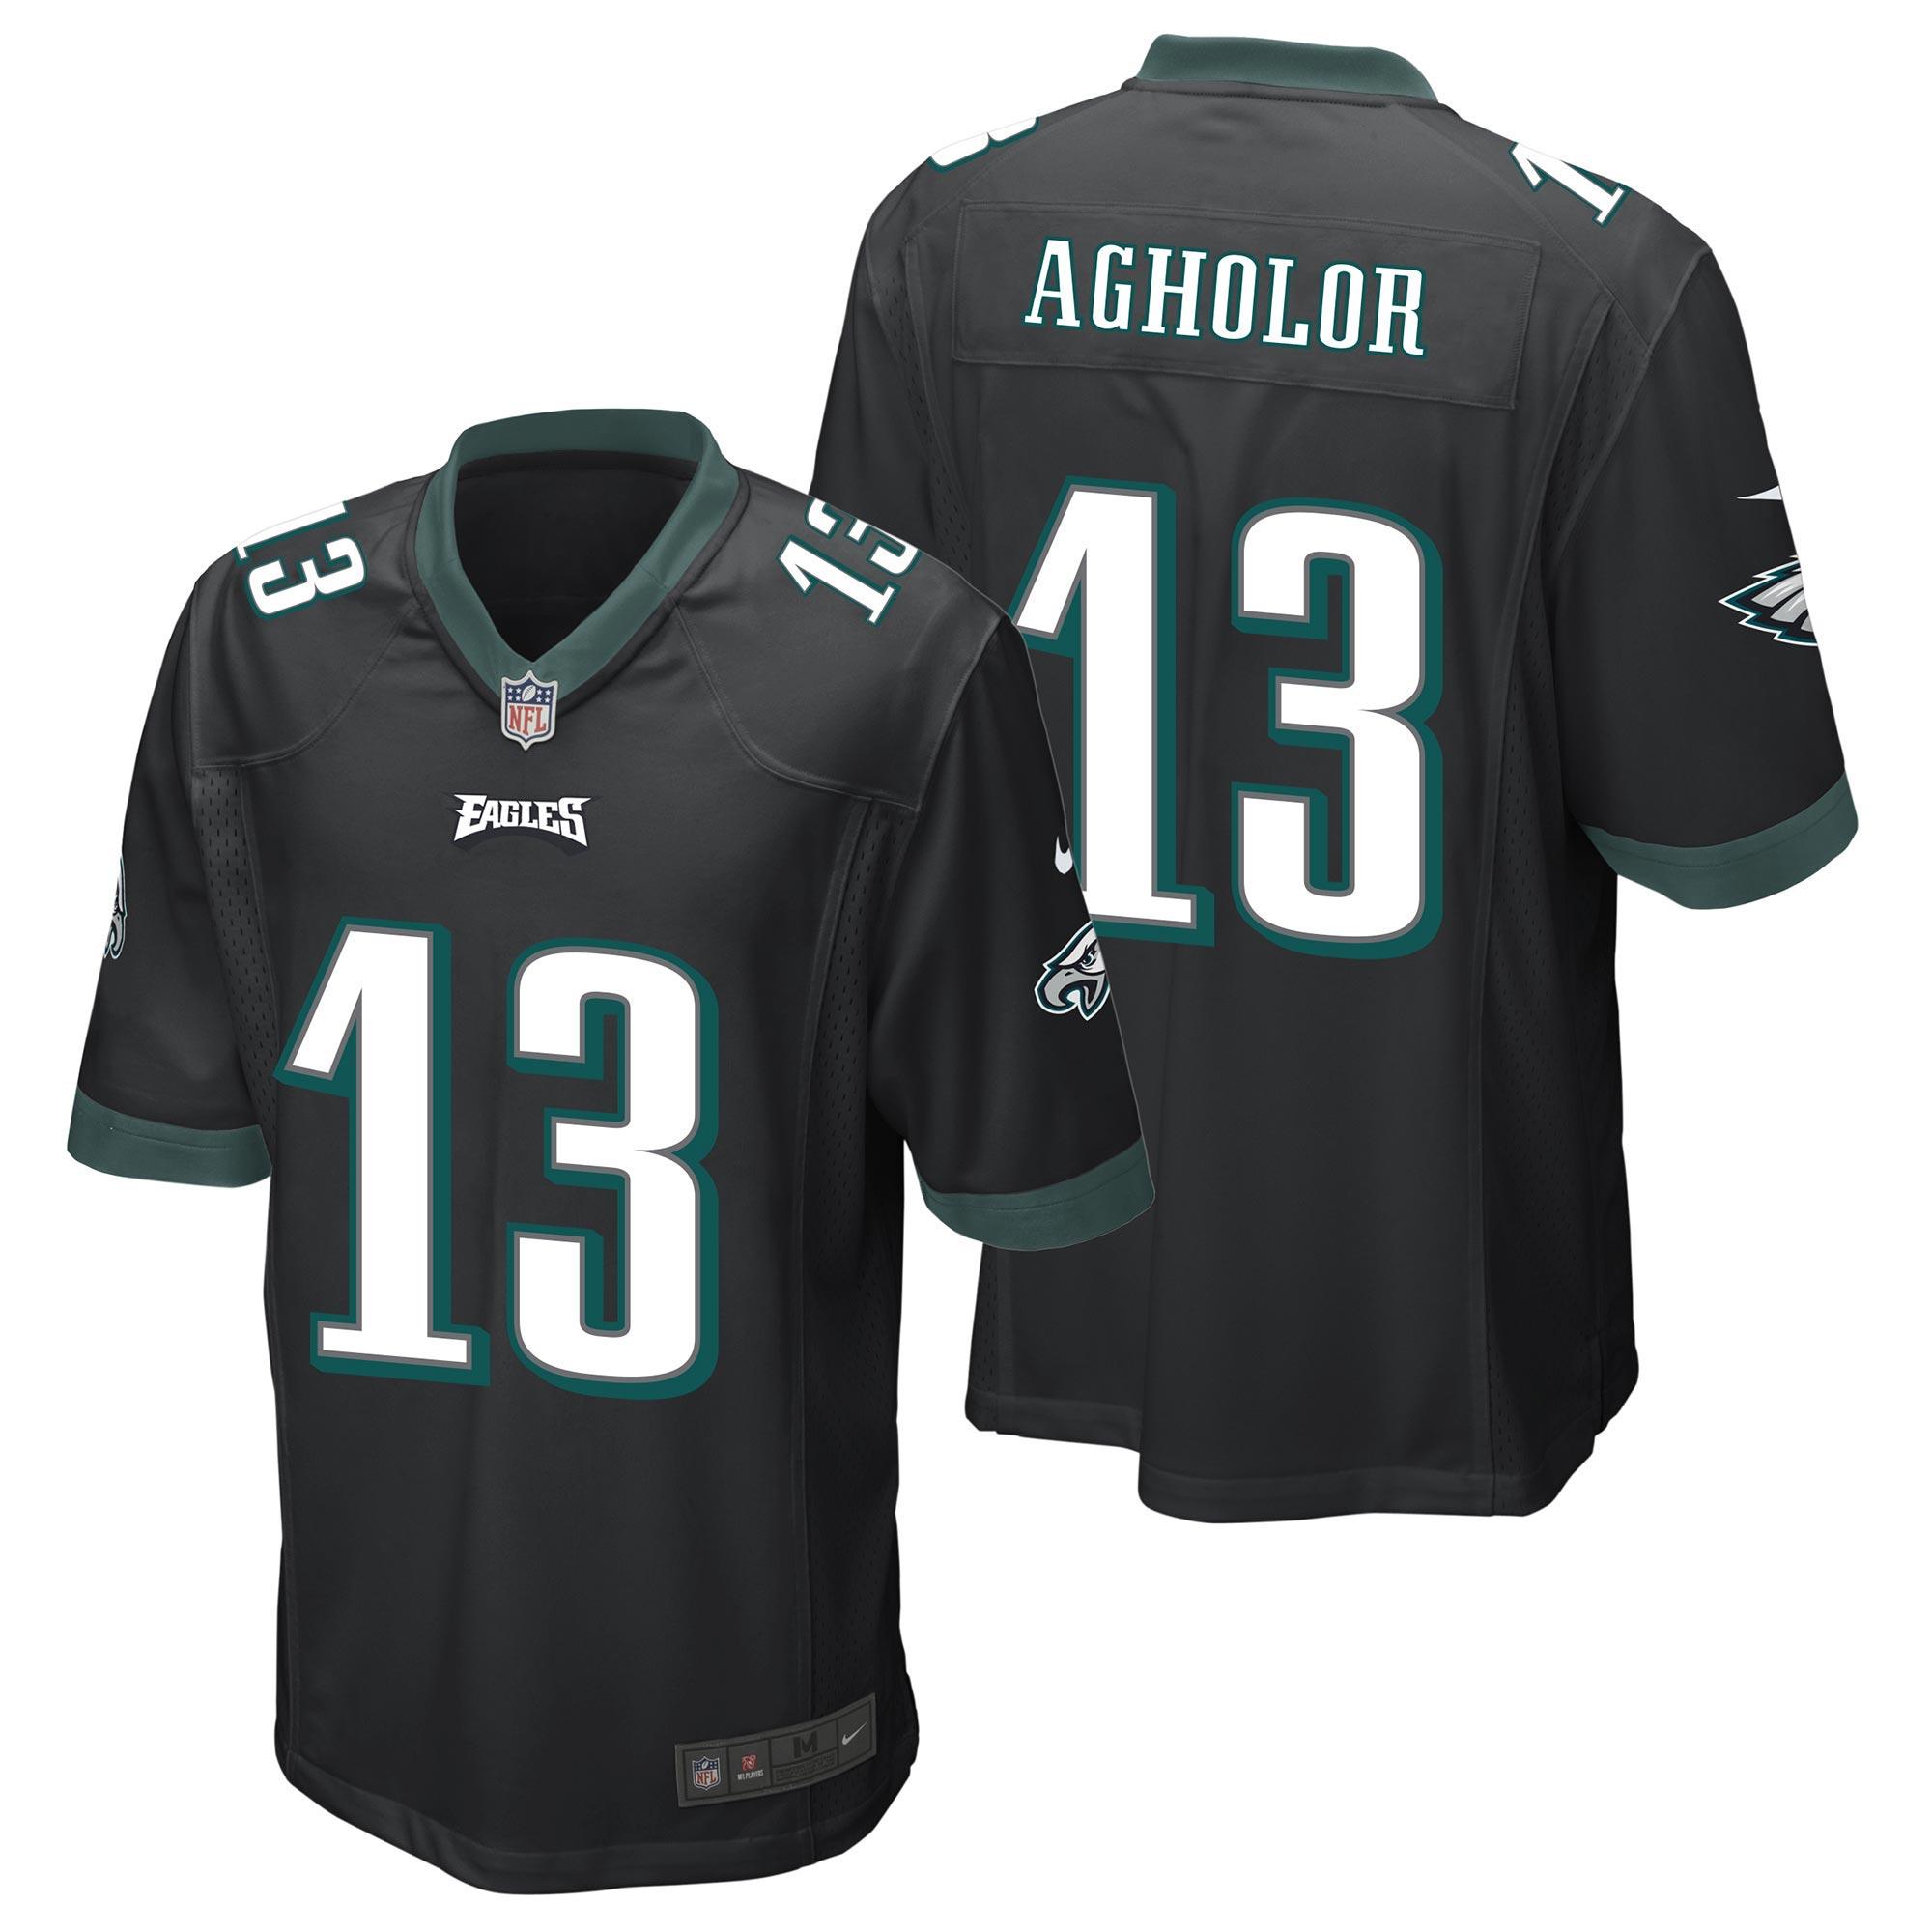 Philadelphia Eagles Ausweichtrikot - Nelson Agholor - Jugendliche